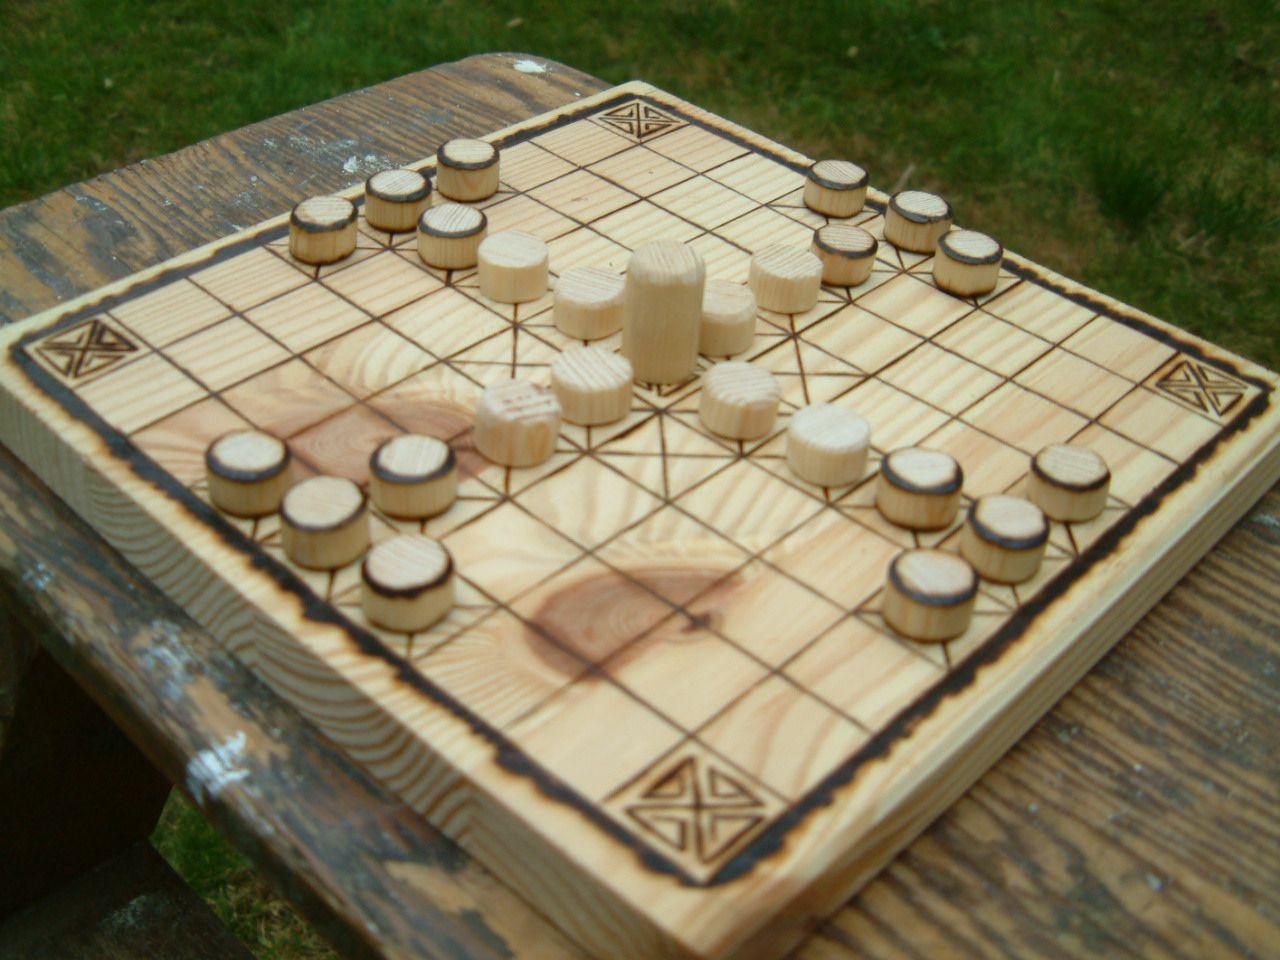 An Old Viking Board Game Vikinggames Pinterest